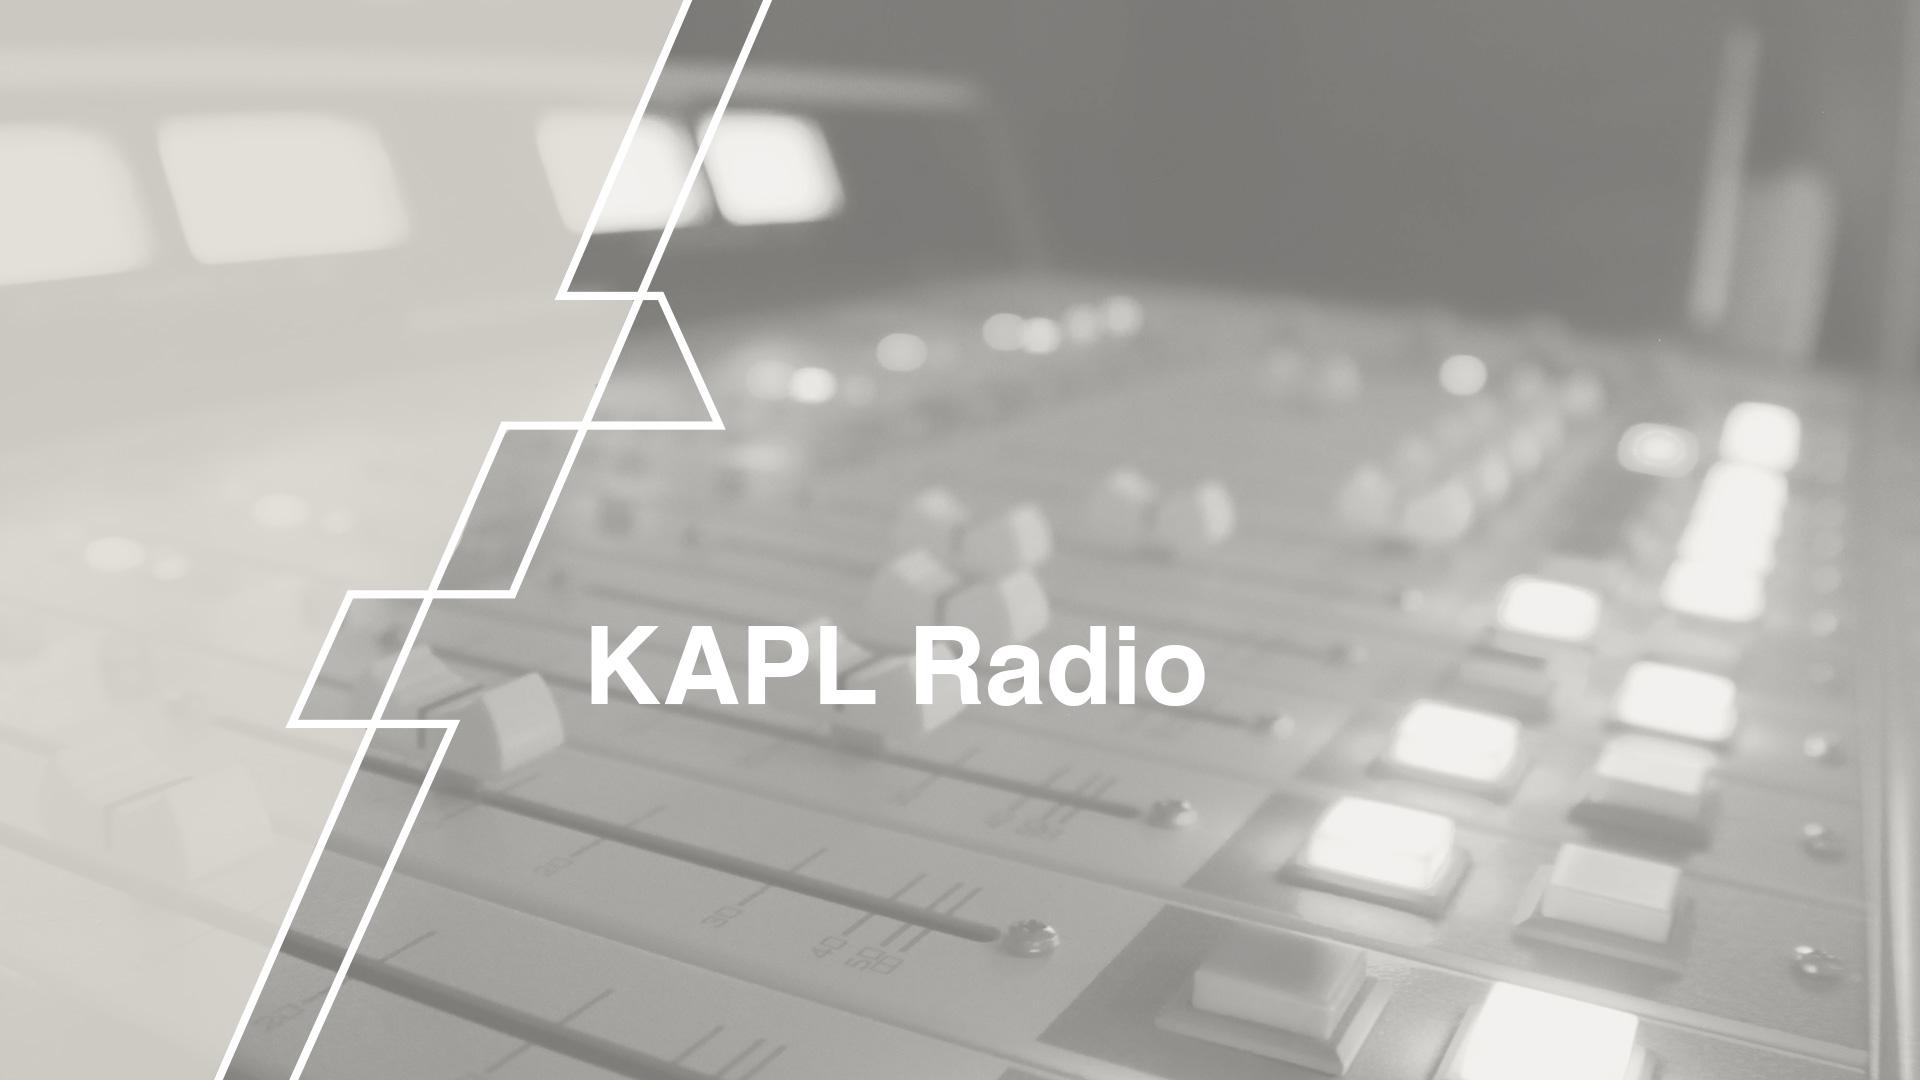 KAPLRadio_1920x1080.jpg